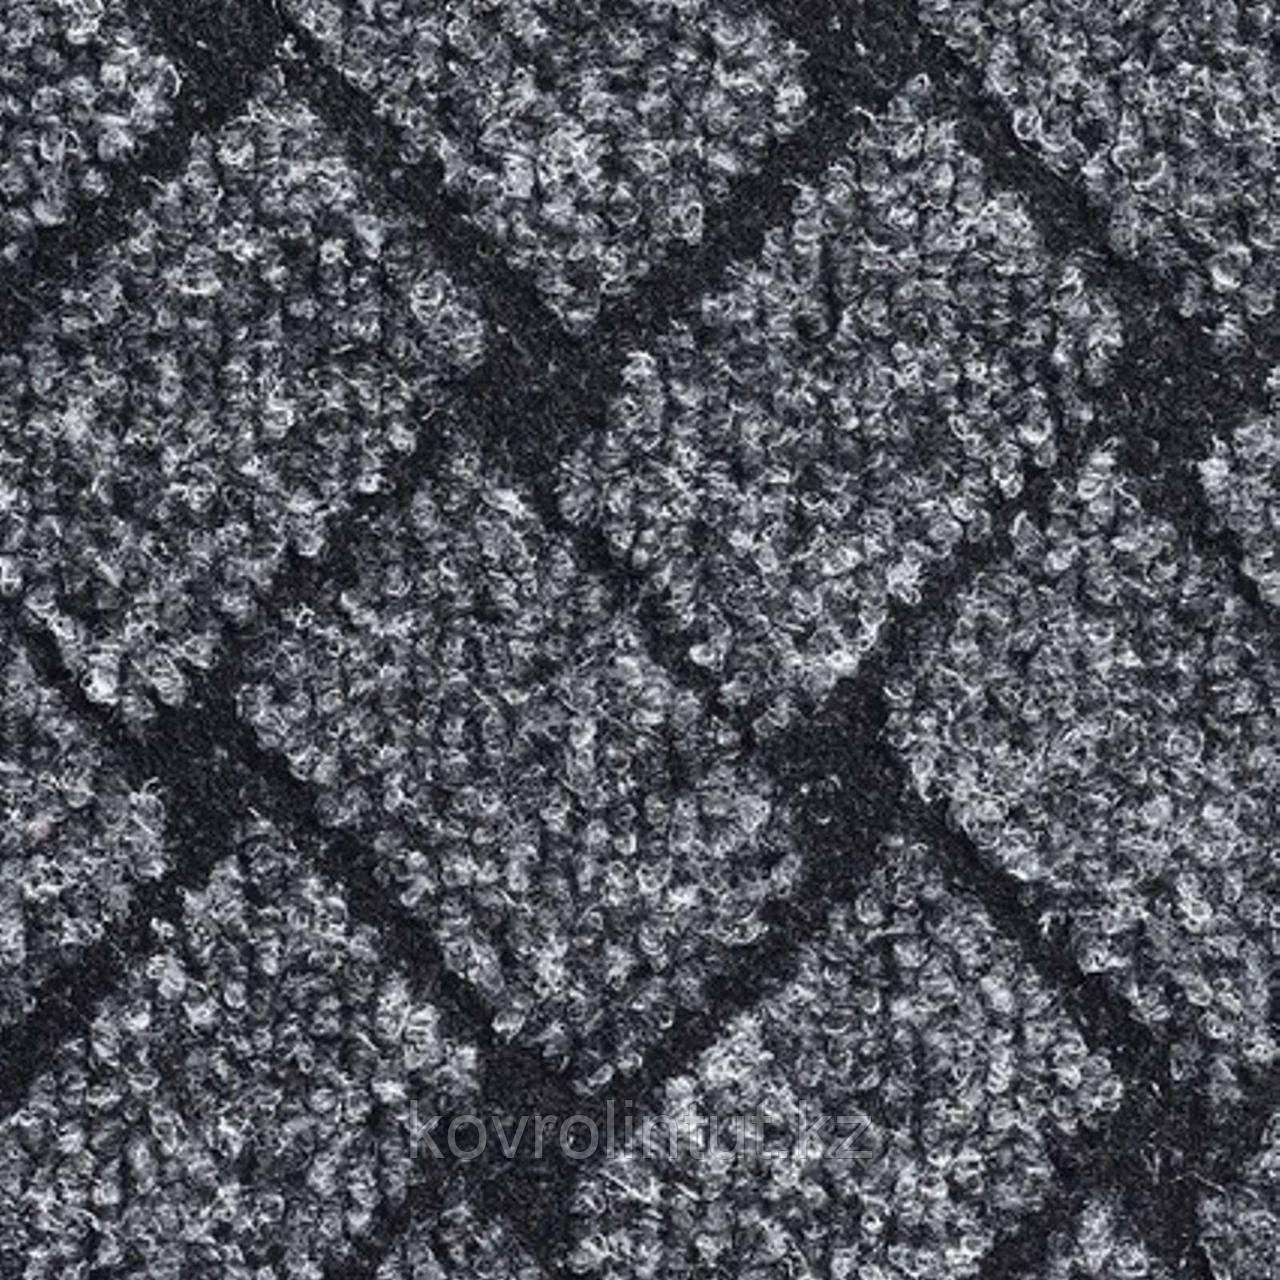 Покрытие ковровое Rhombus 70, 4 м, серый, 75% PP/25% PES